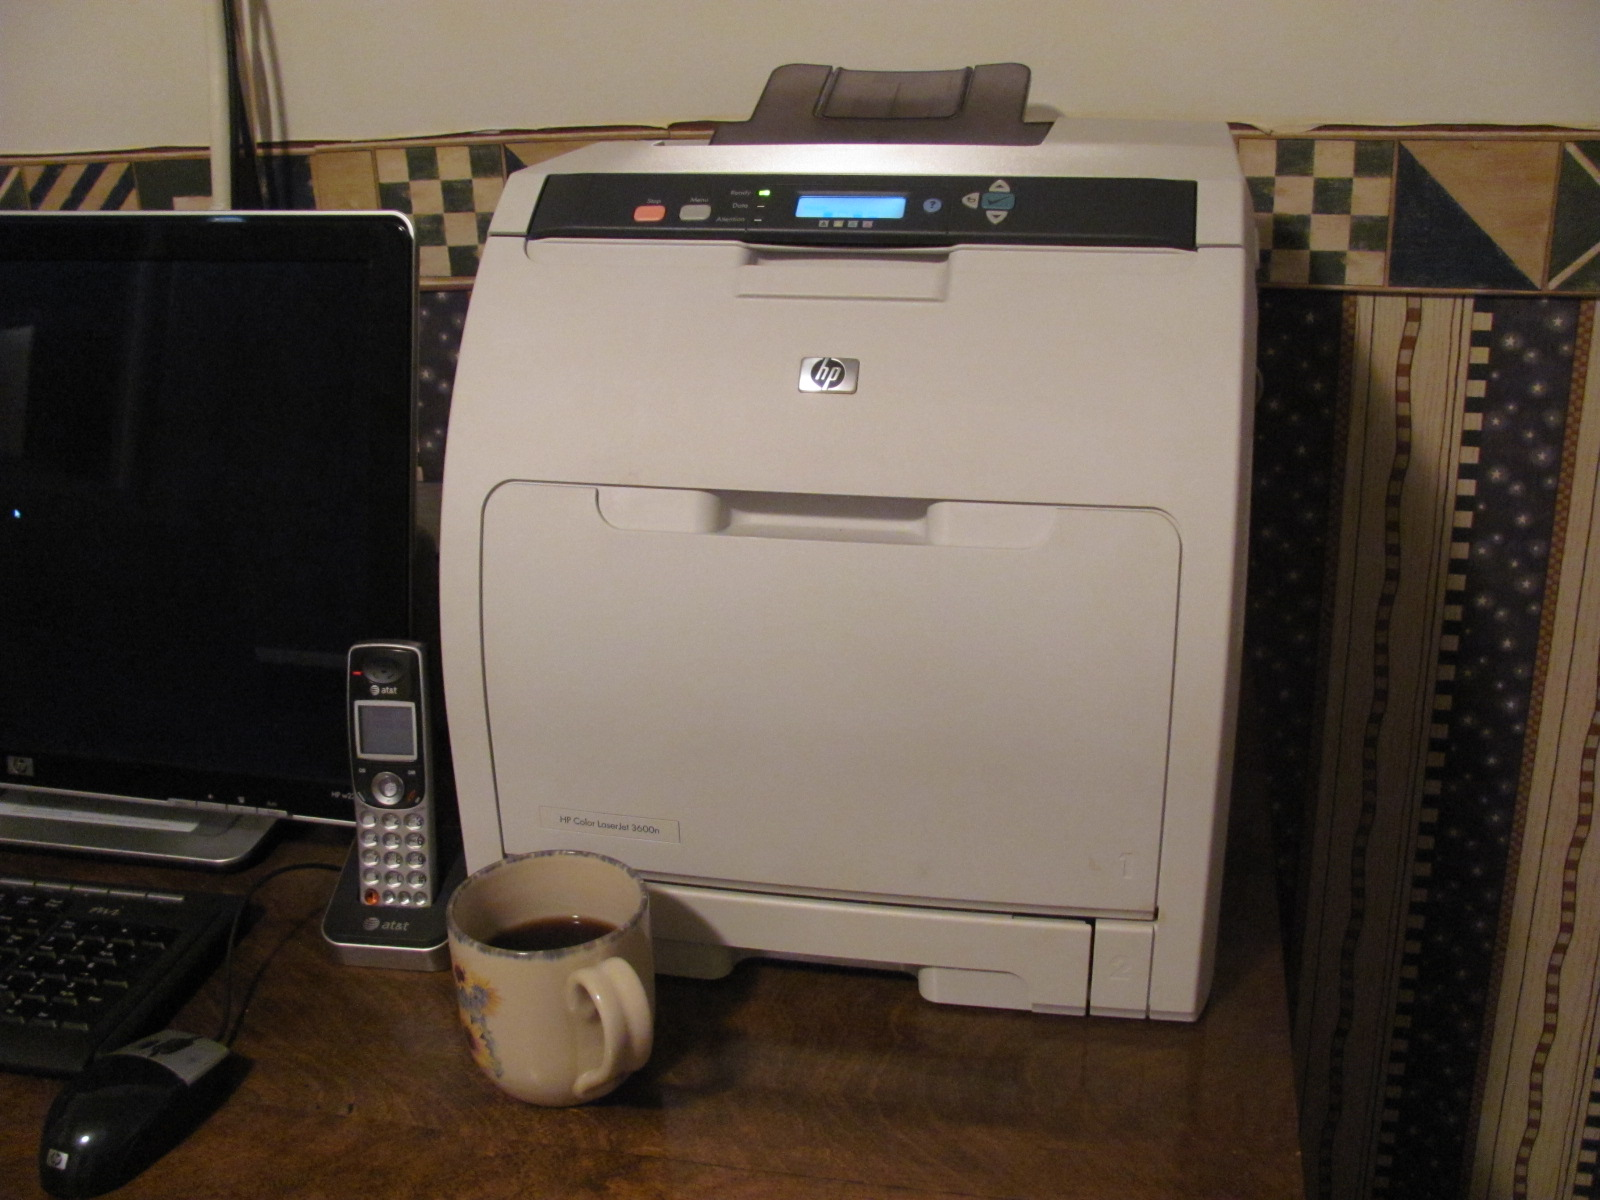 Hp Color Laserjet 4700 Price Per Page Best Inkjet Best Color Laser Printer Cost Per Page